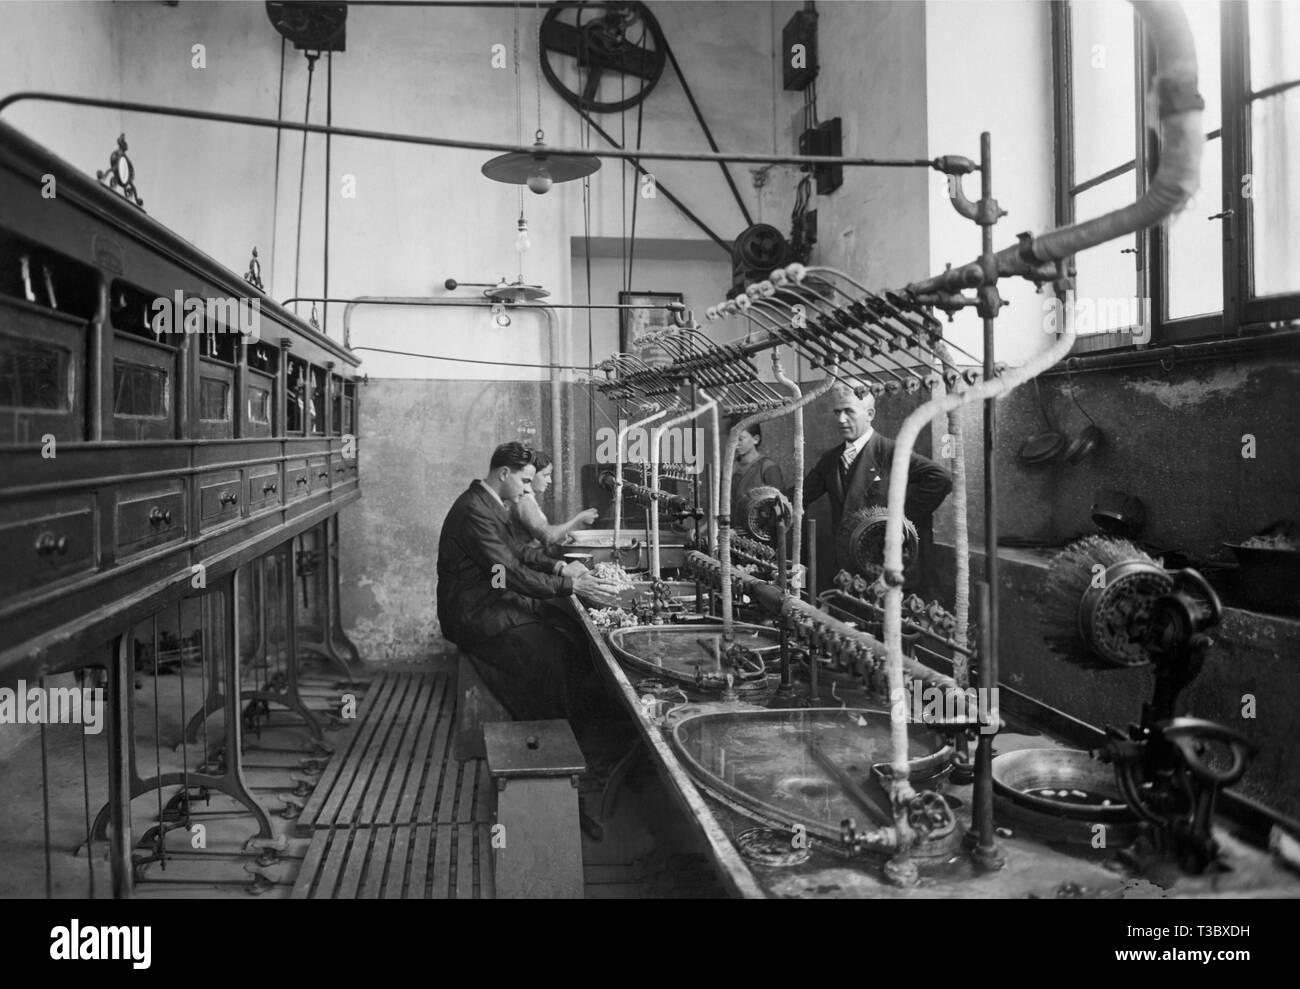 silk processing, 1939 - Stock Image